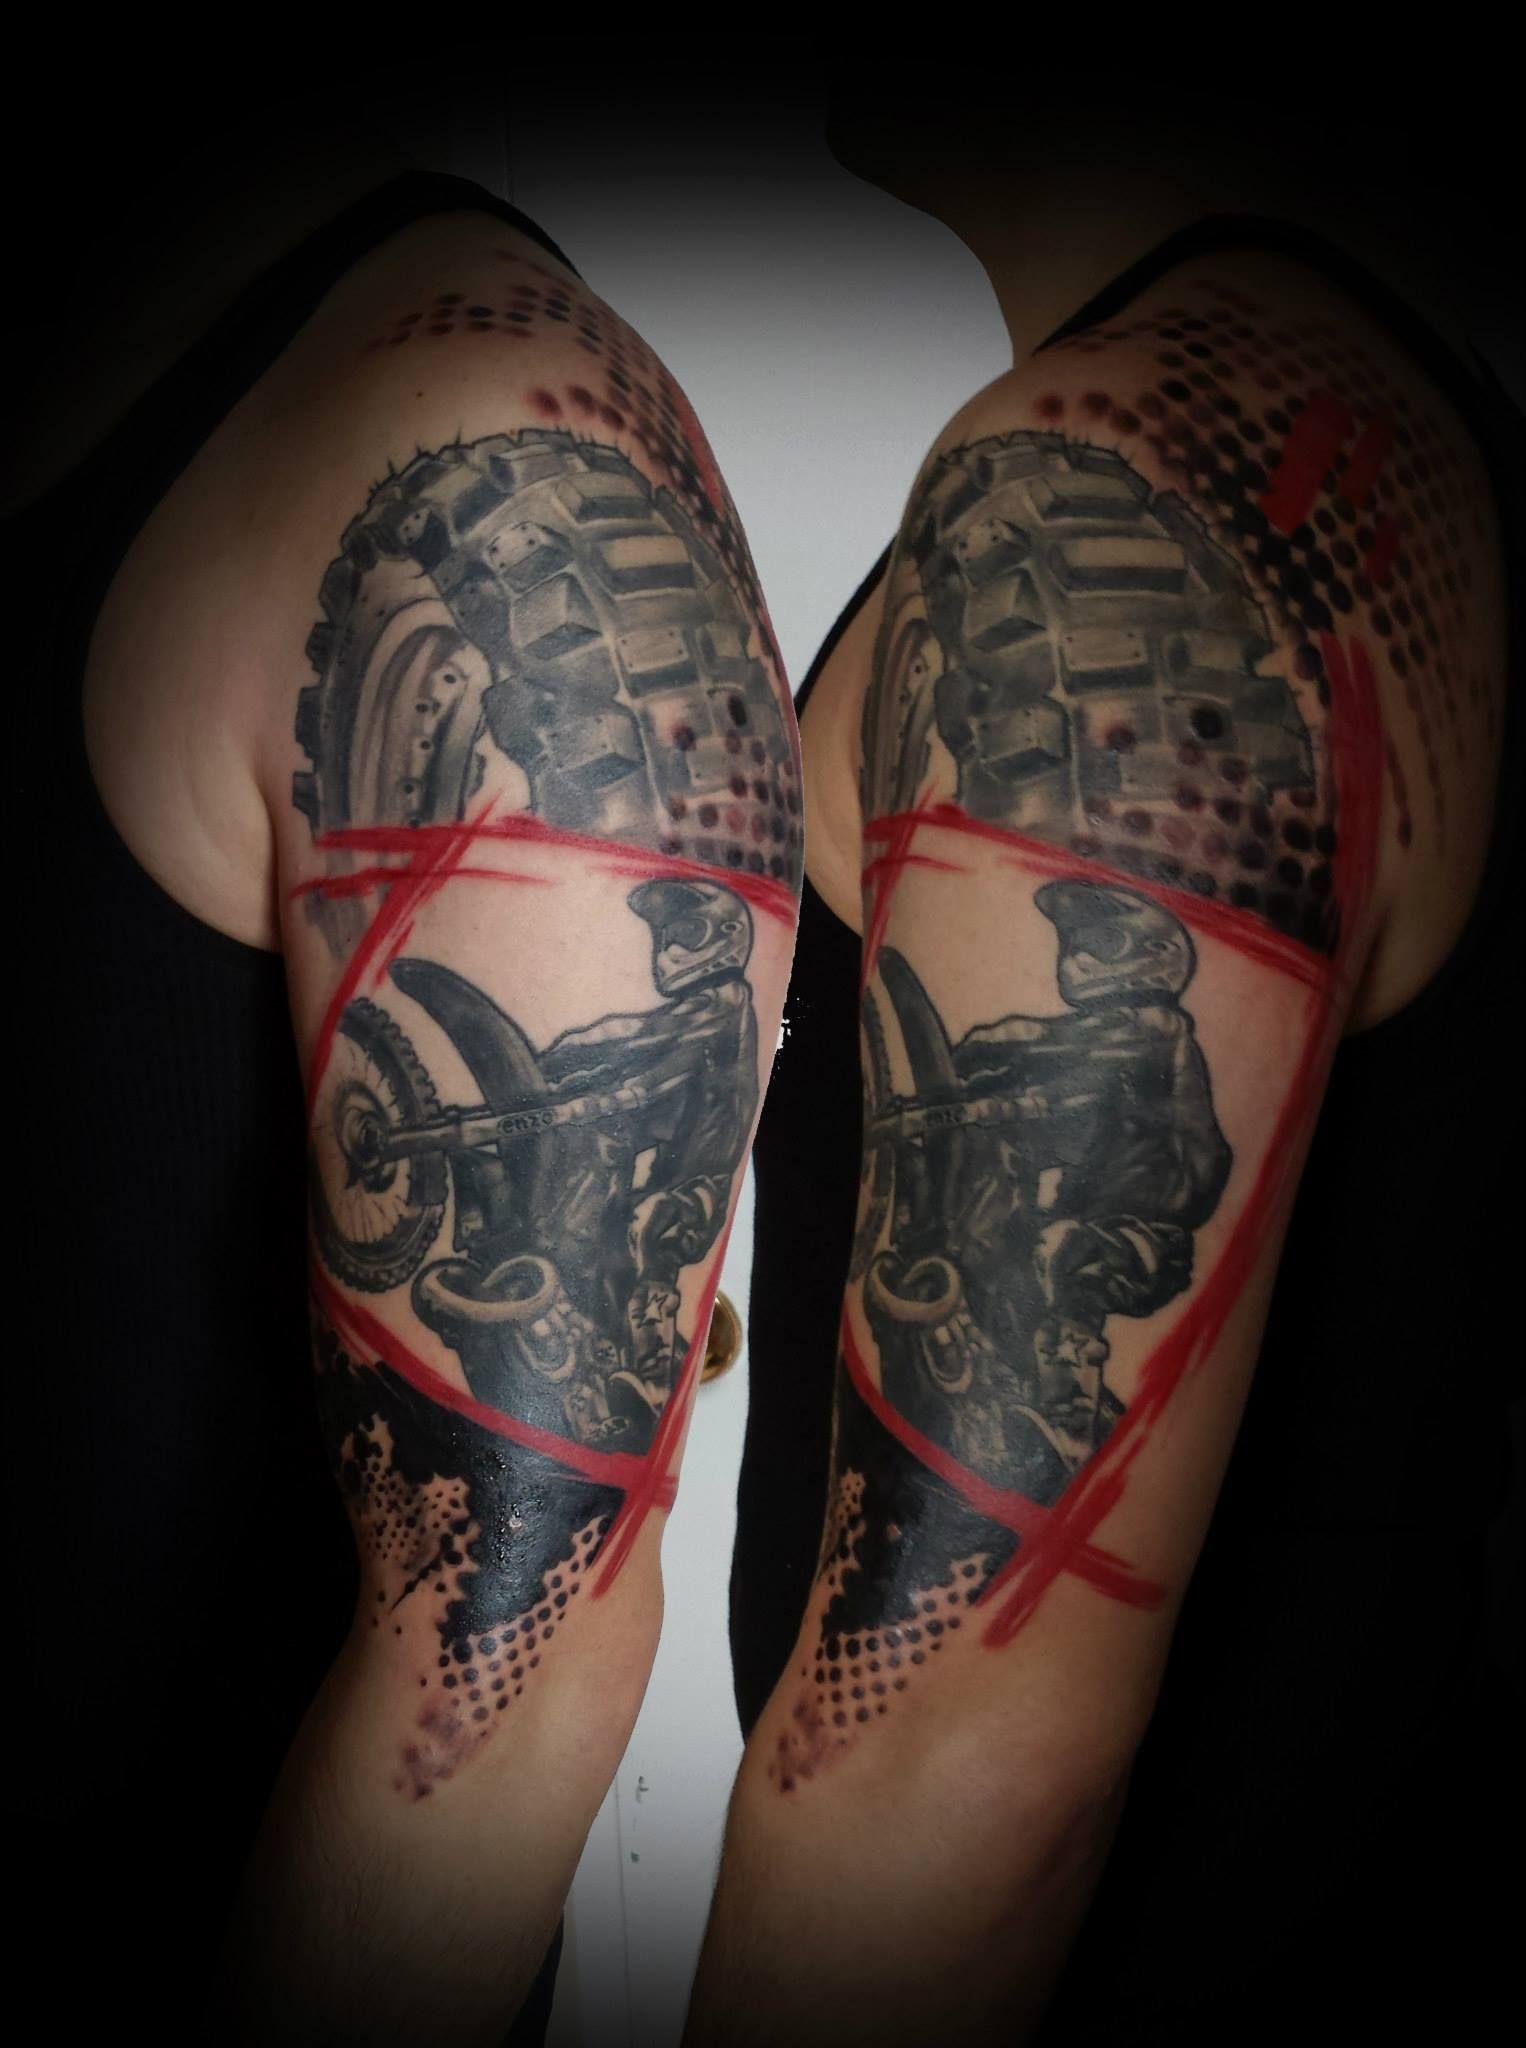 Chronic Ink Tattoo, Toronto Tattoo Dirt bike half sleeve